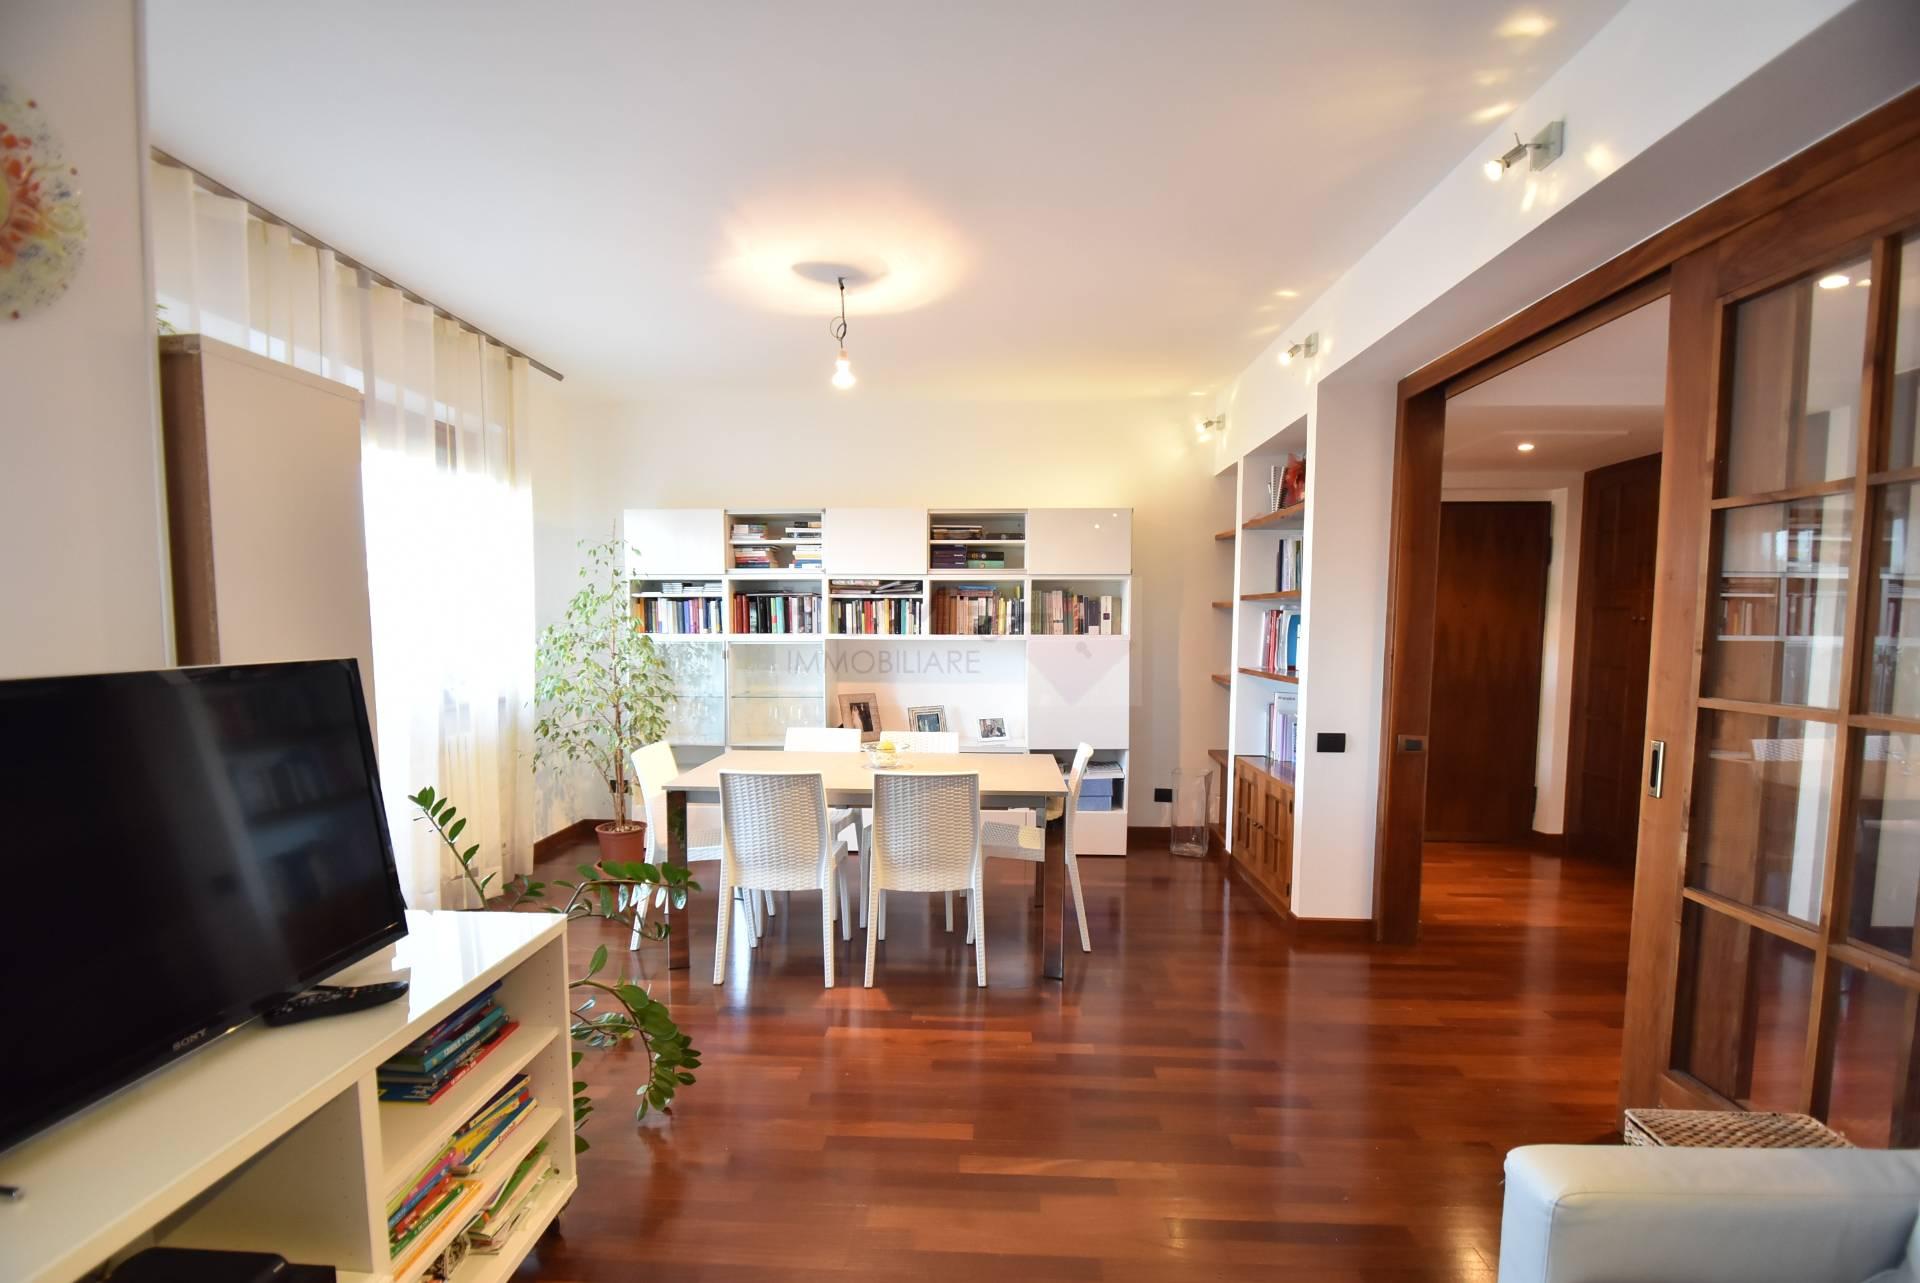 Annunci immobiliari di vendita a macerata for Case in vendita macerata